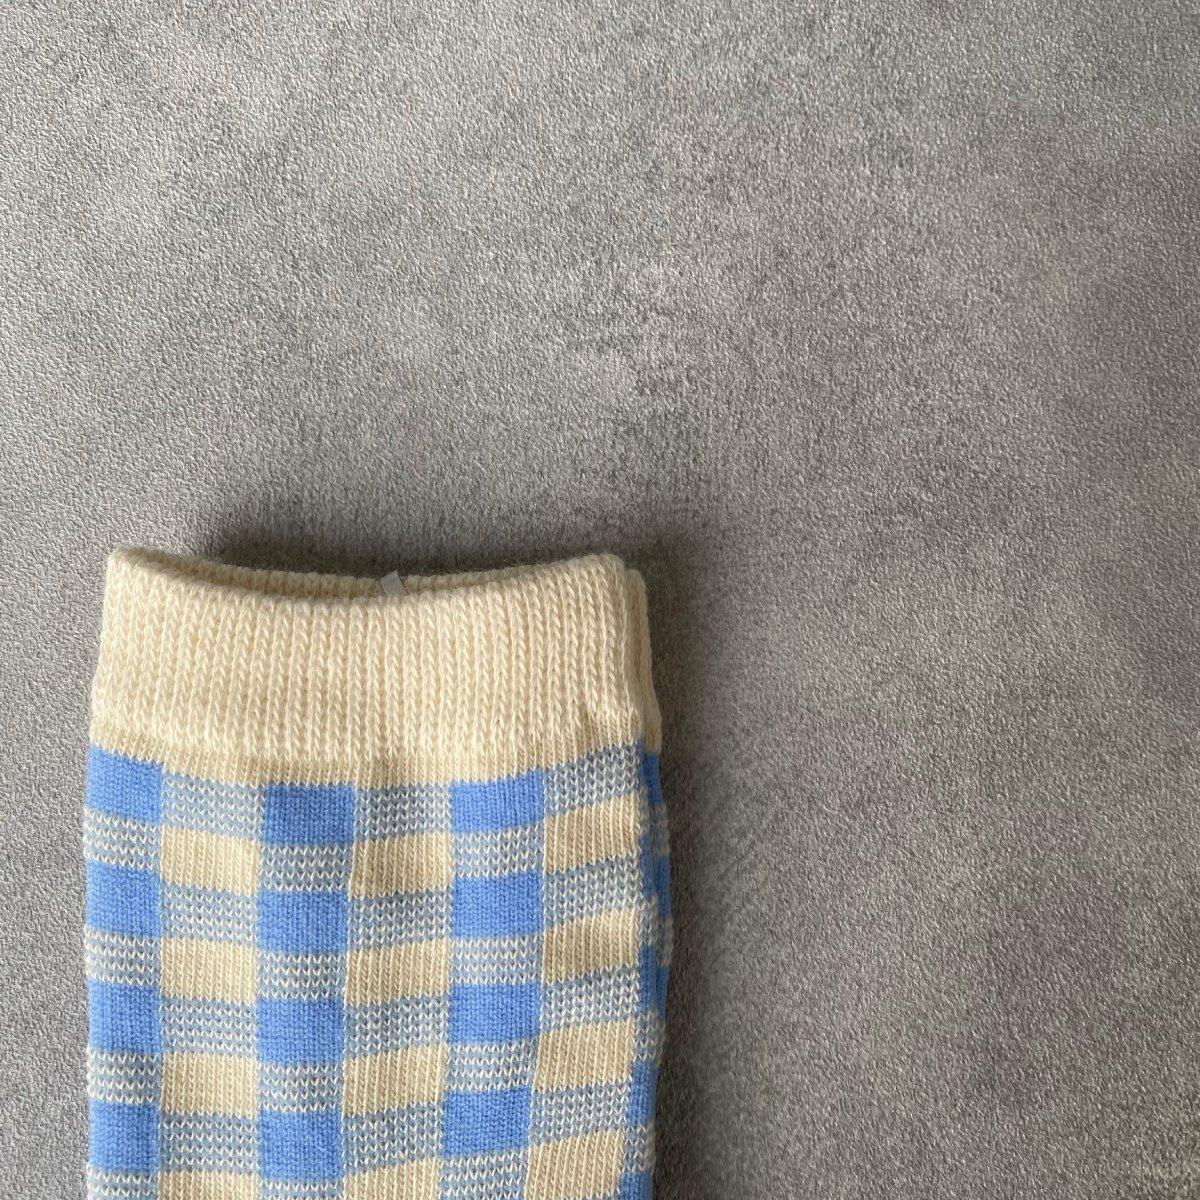 【KIDS】Natural Check Socks 詳細画像12